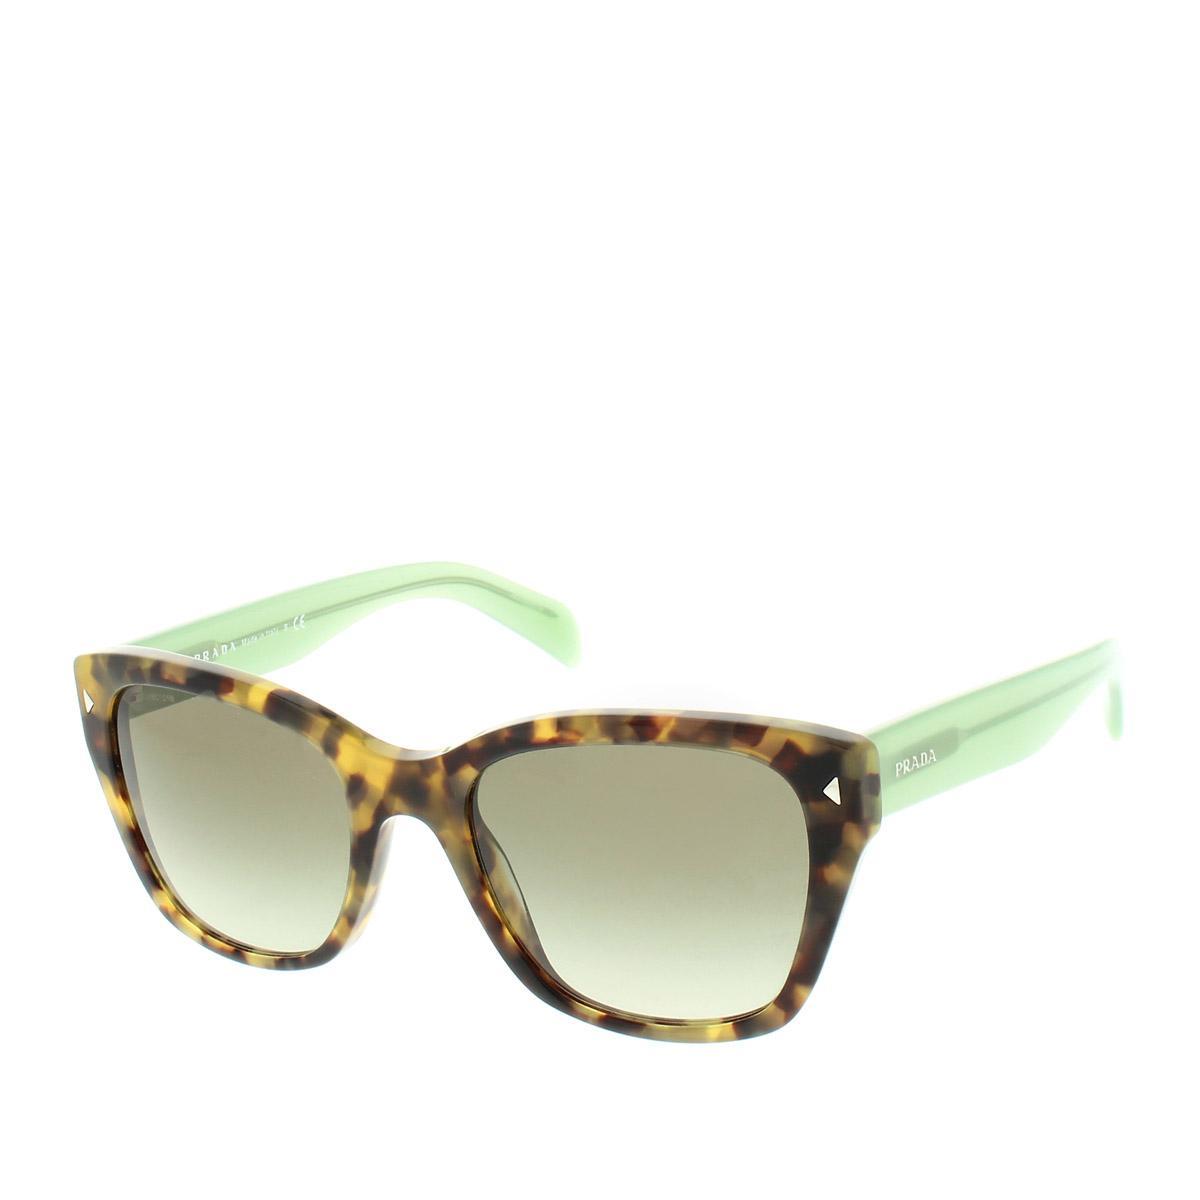 Gafas 36 Prada dorado marrón para damas Pr sol Zvn4p0 0pr65ts de rI7Rr1